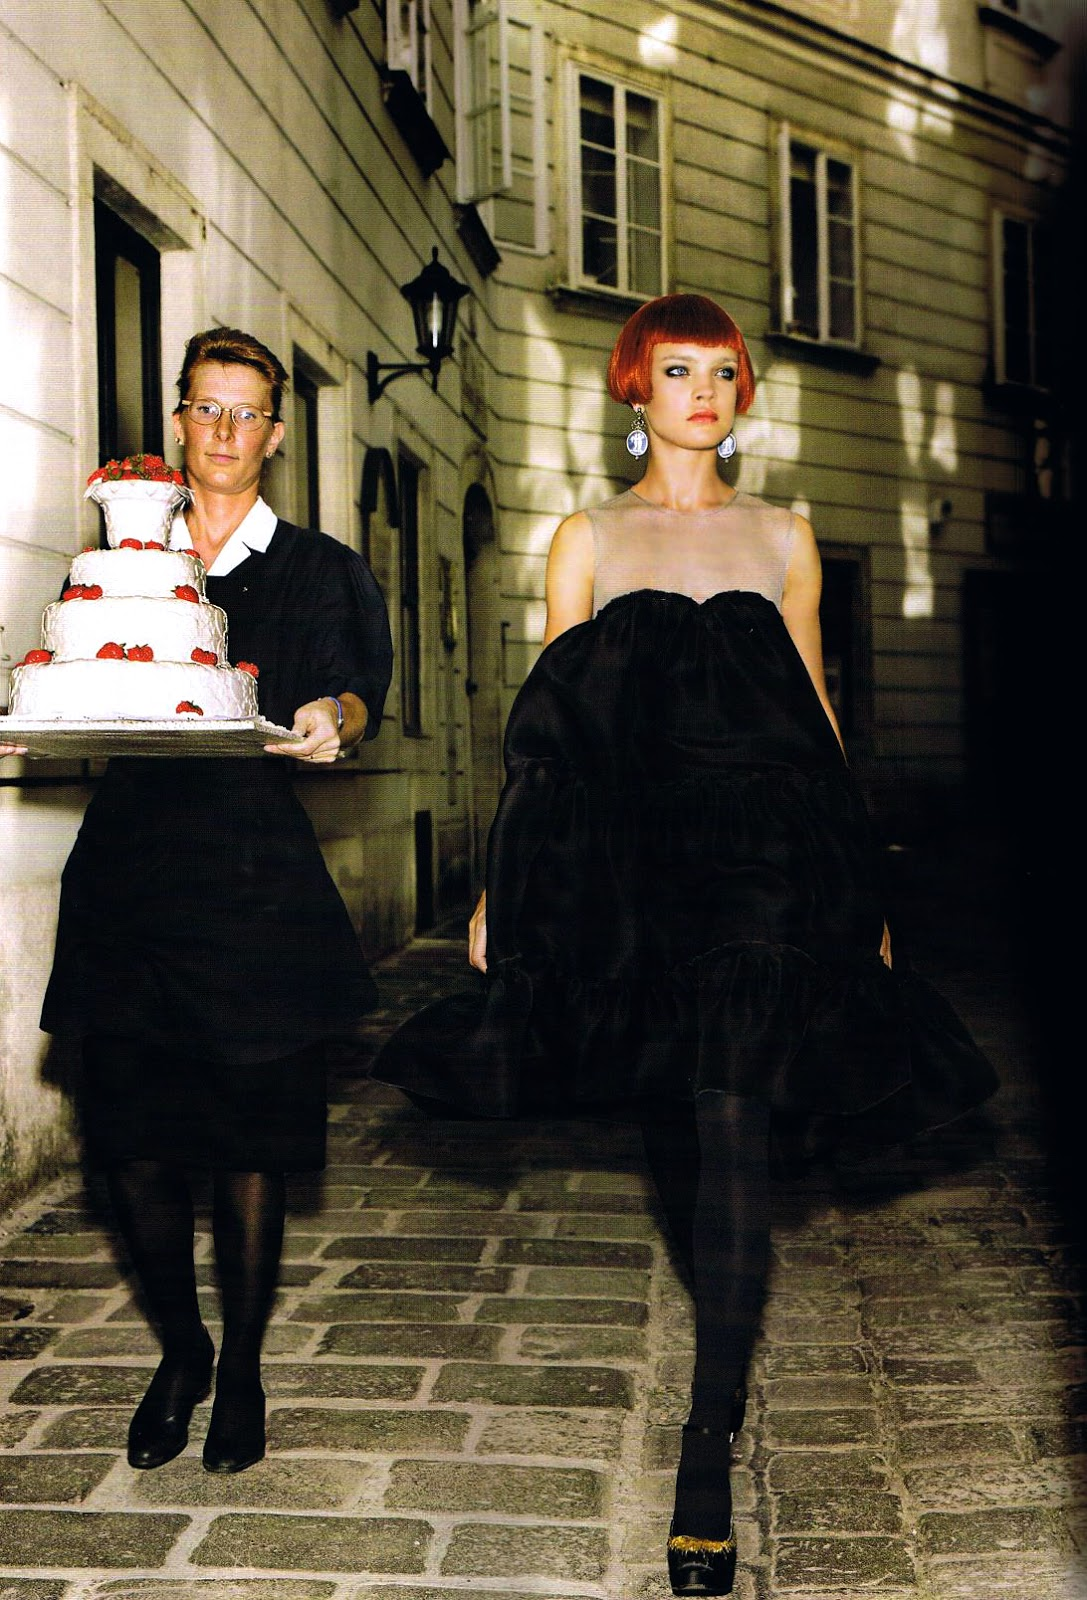 Natalia Vodianova in Lanvin by Alber Elbaz dress in The Last Waltz / Vogue US September 2006 (photography: Mario Testino, styling: Grace Coddington) via www.fashionedylove.co.uk british fashion blog